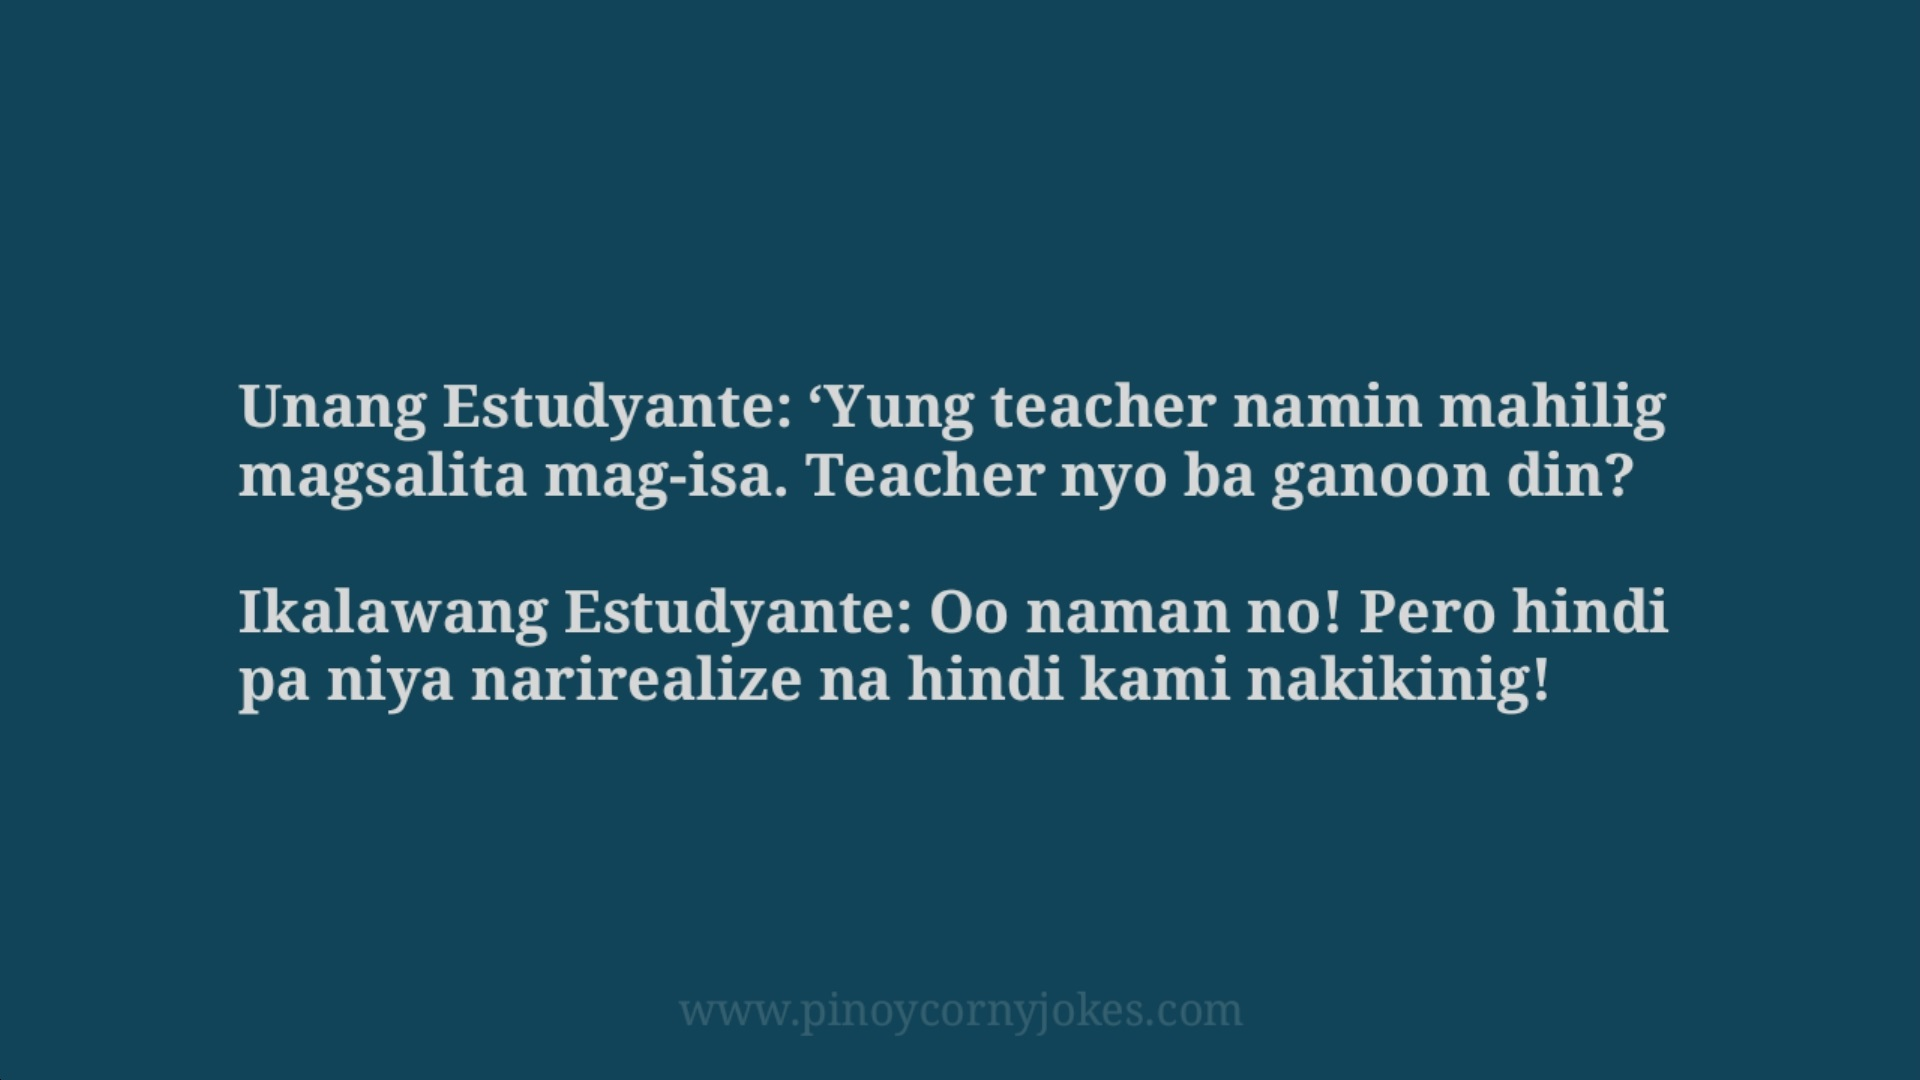 mahilig magsalita tagalog jokes school